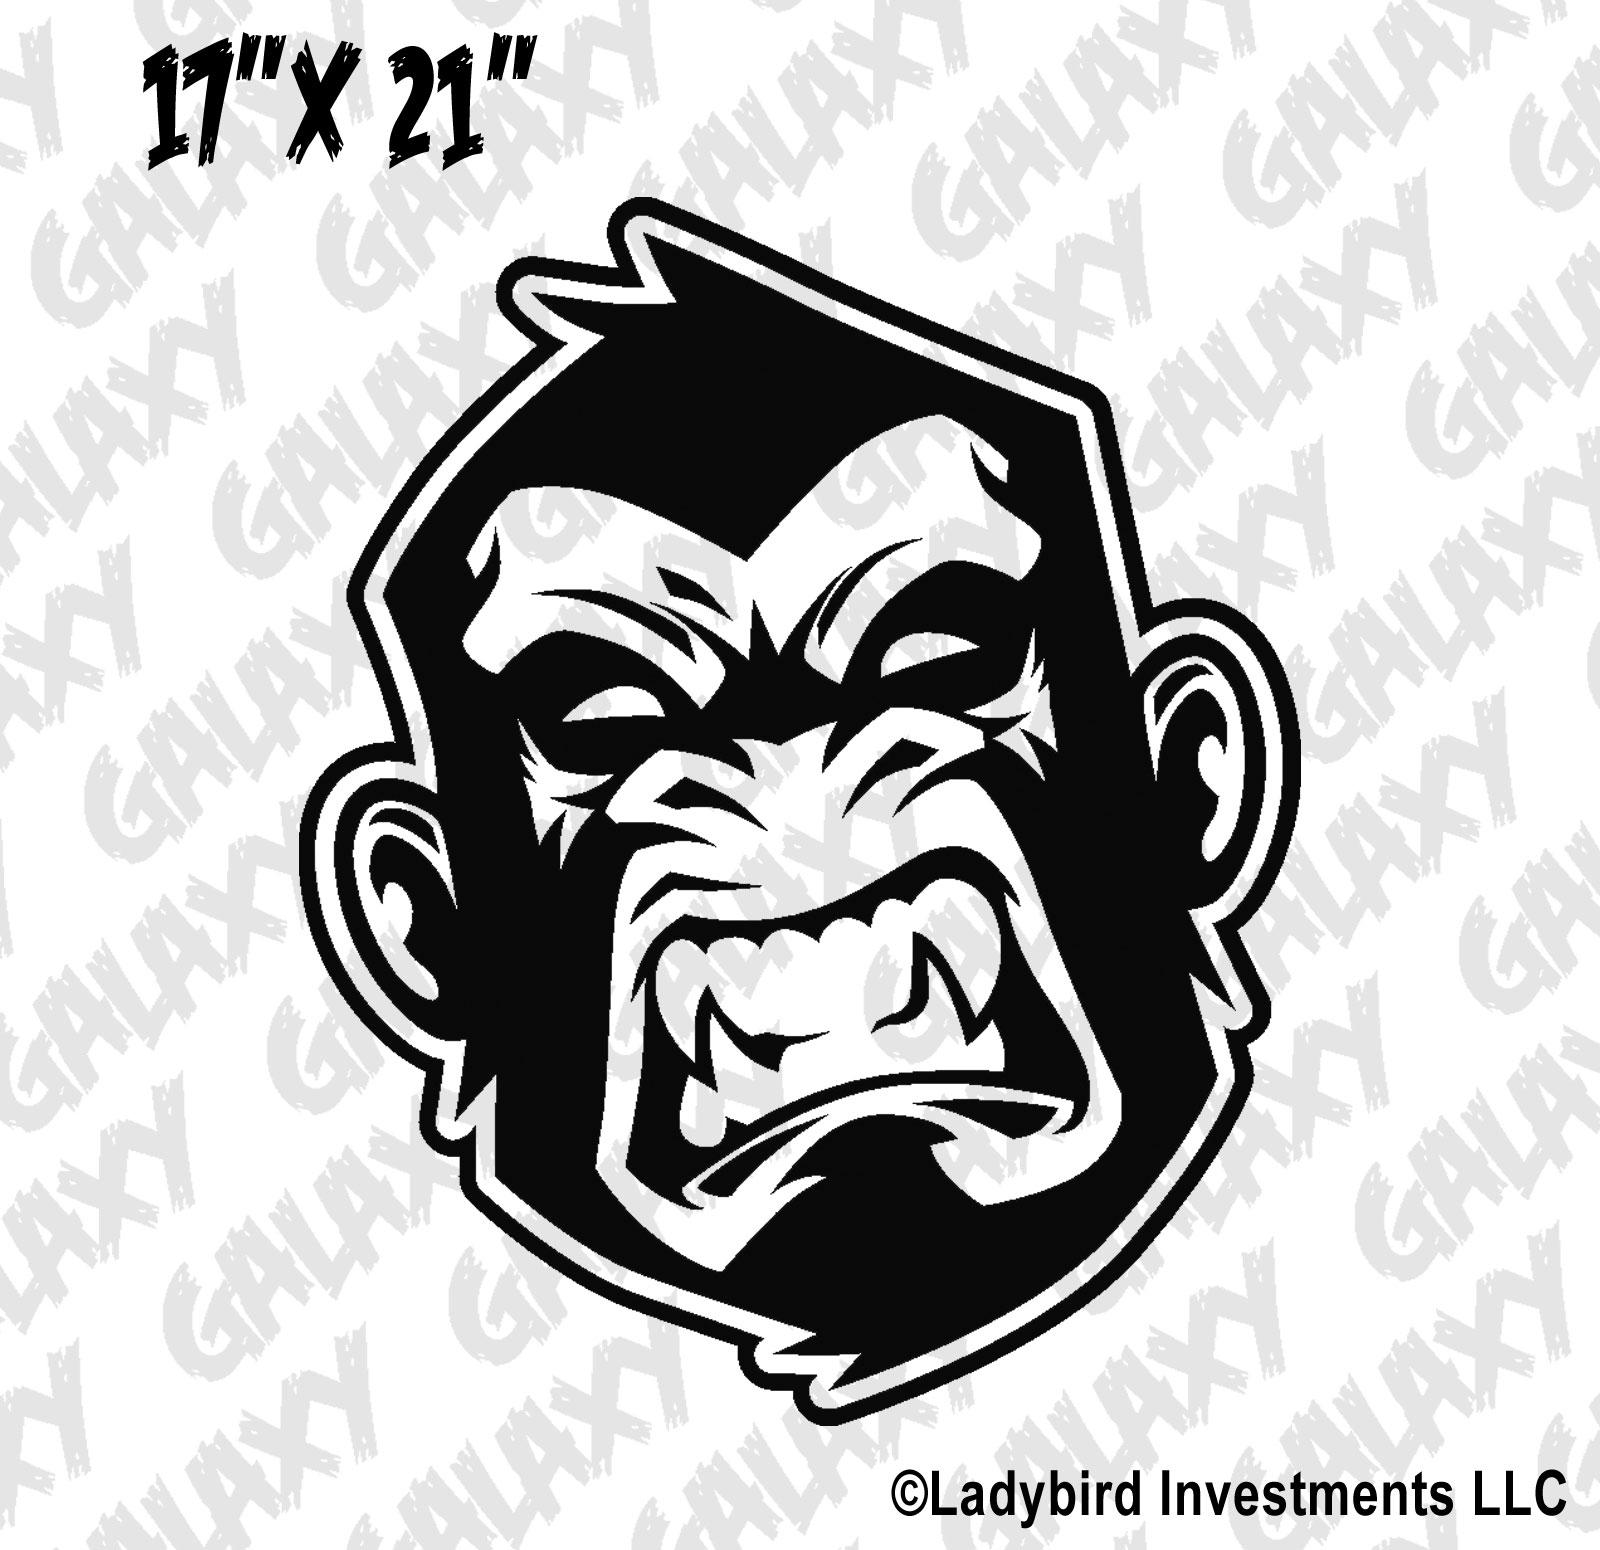 Jeep Wrangler Hood Decal Angry Monkey Sticker Skunkmonkey